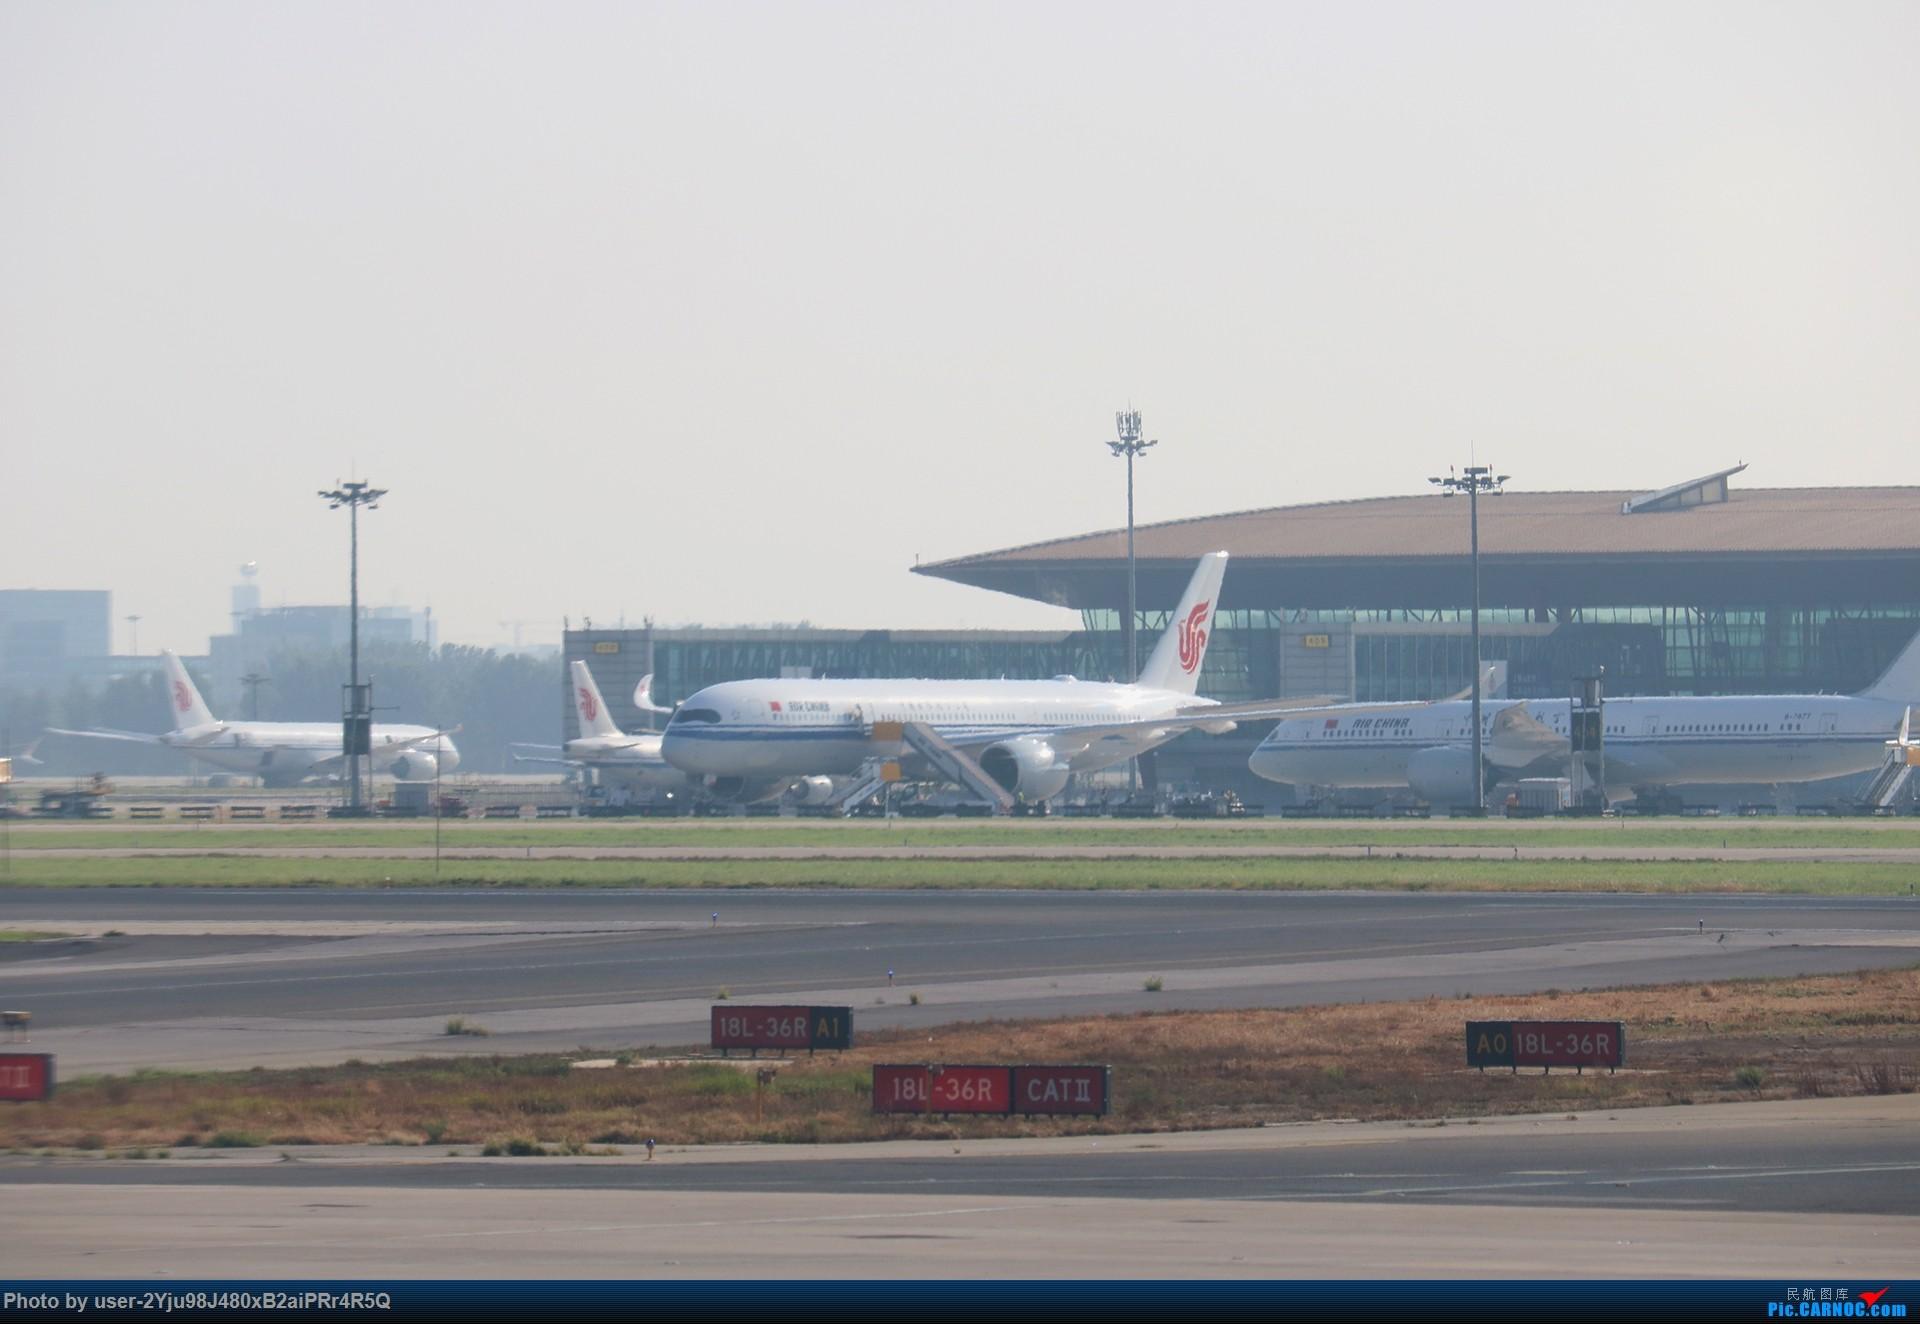 Re:[原创]LIULIU|一天两种机型三个国家四段航线五座城市的回家之路|西伯利亚上空的星光 AIRBUS A350-900 B-1086 中国北京首都国际机场